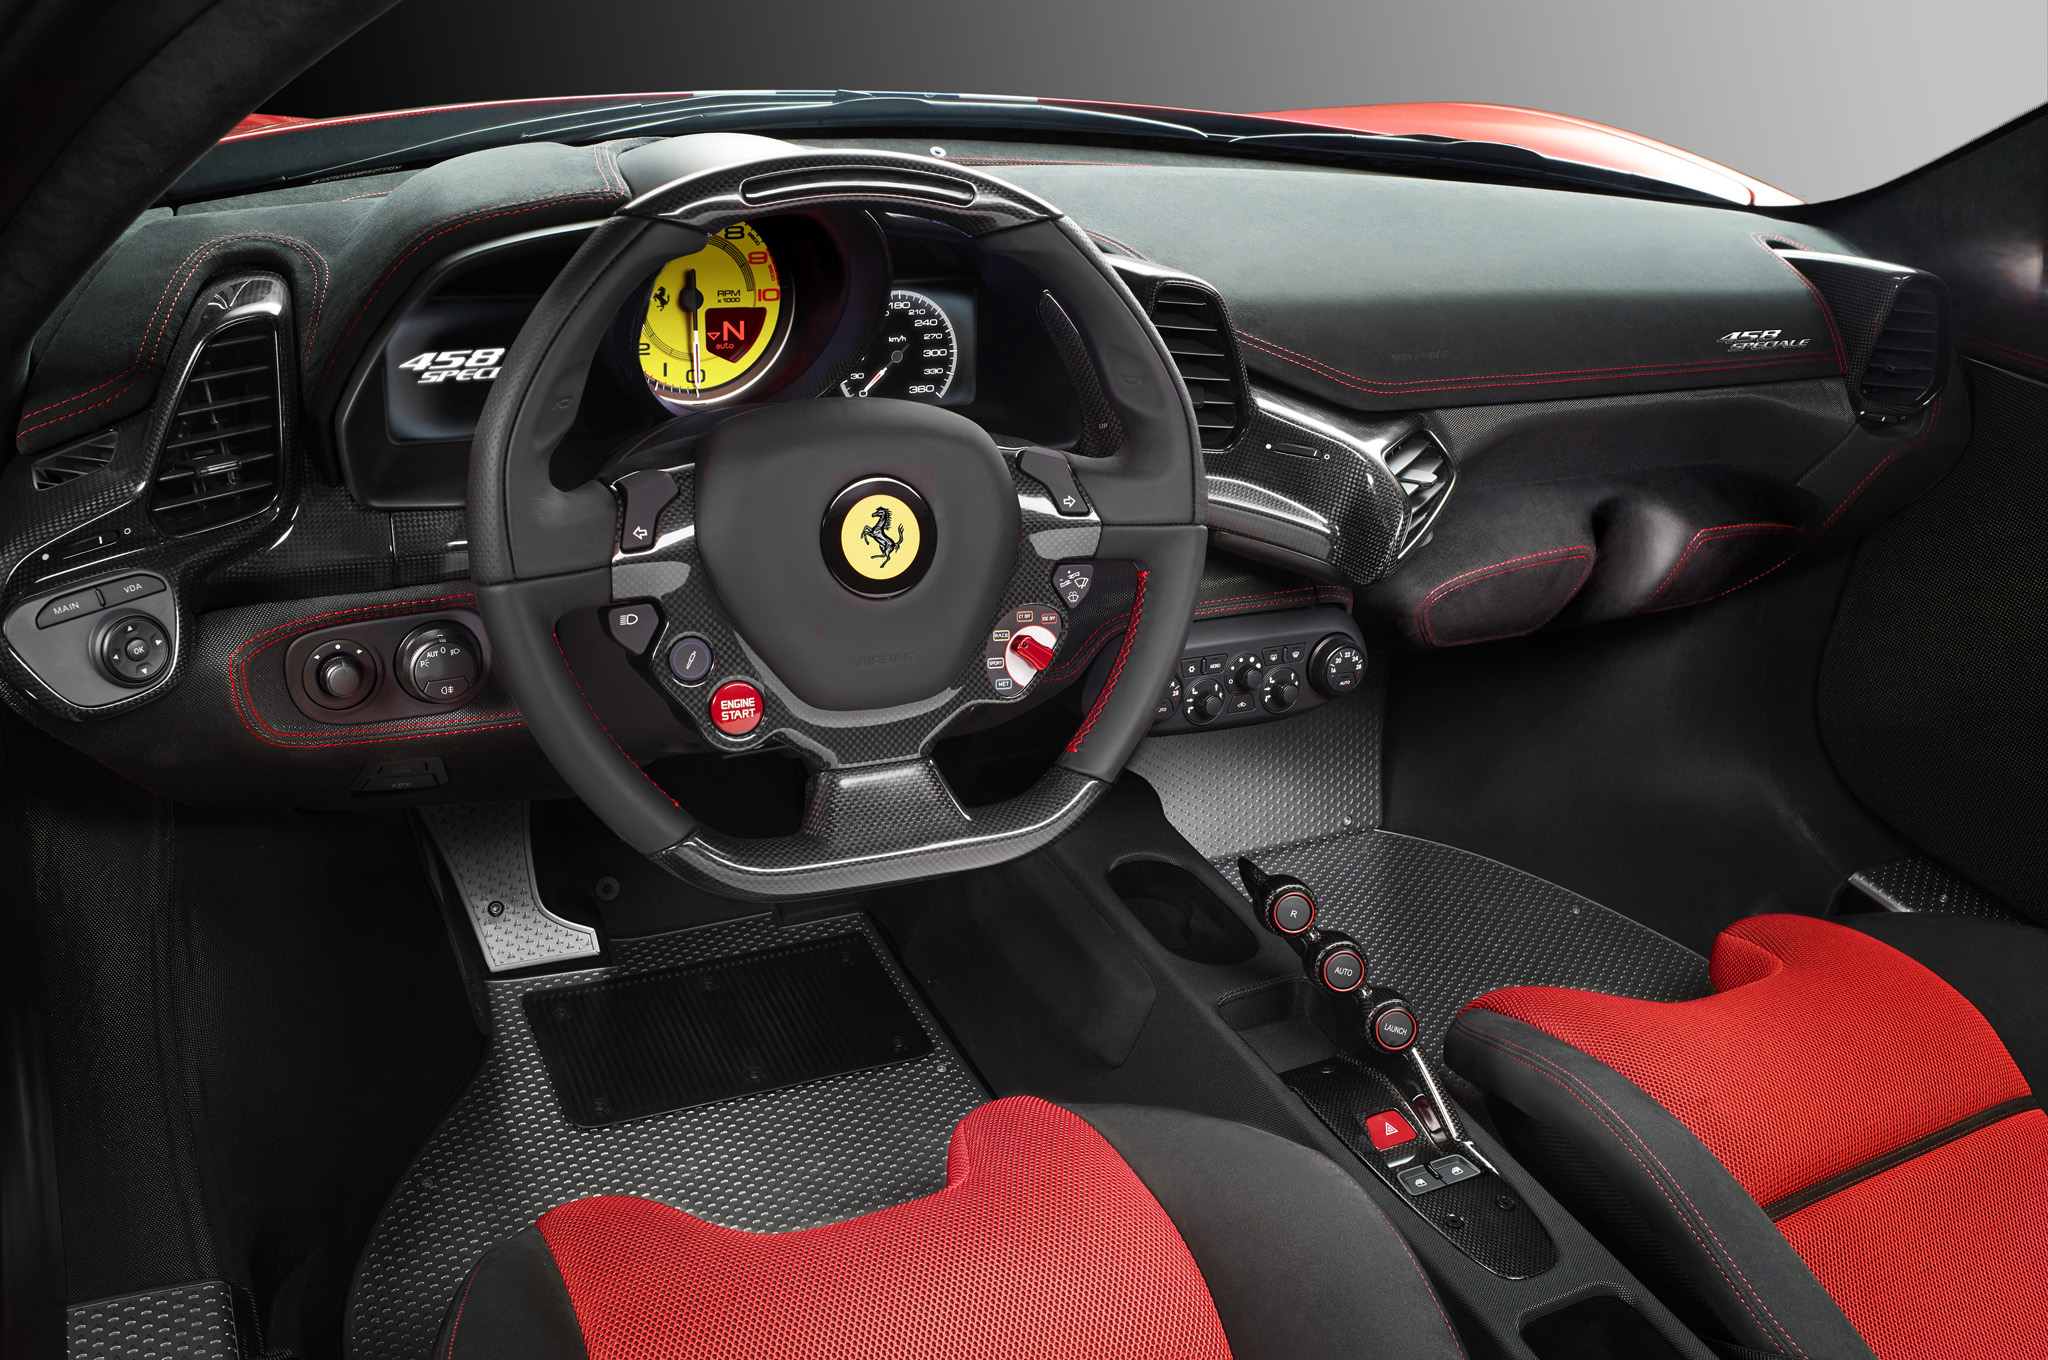 458 speciale interior